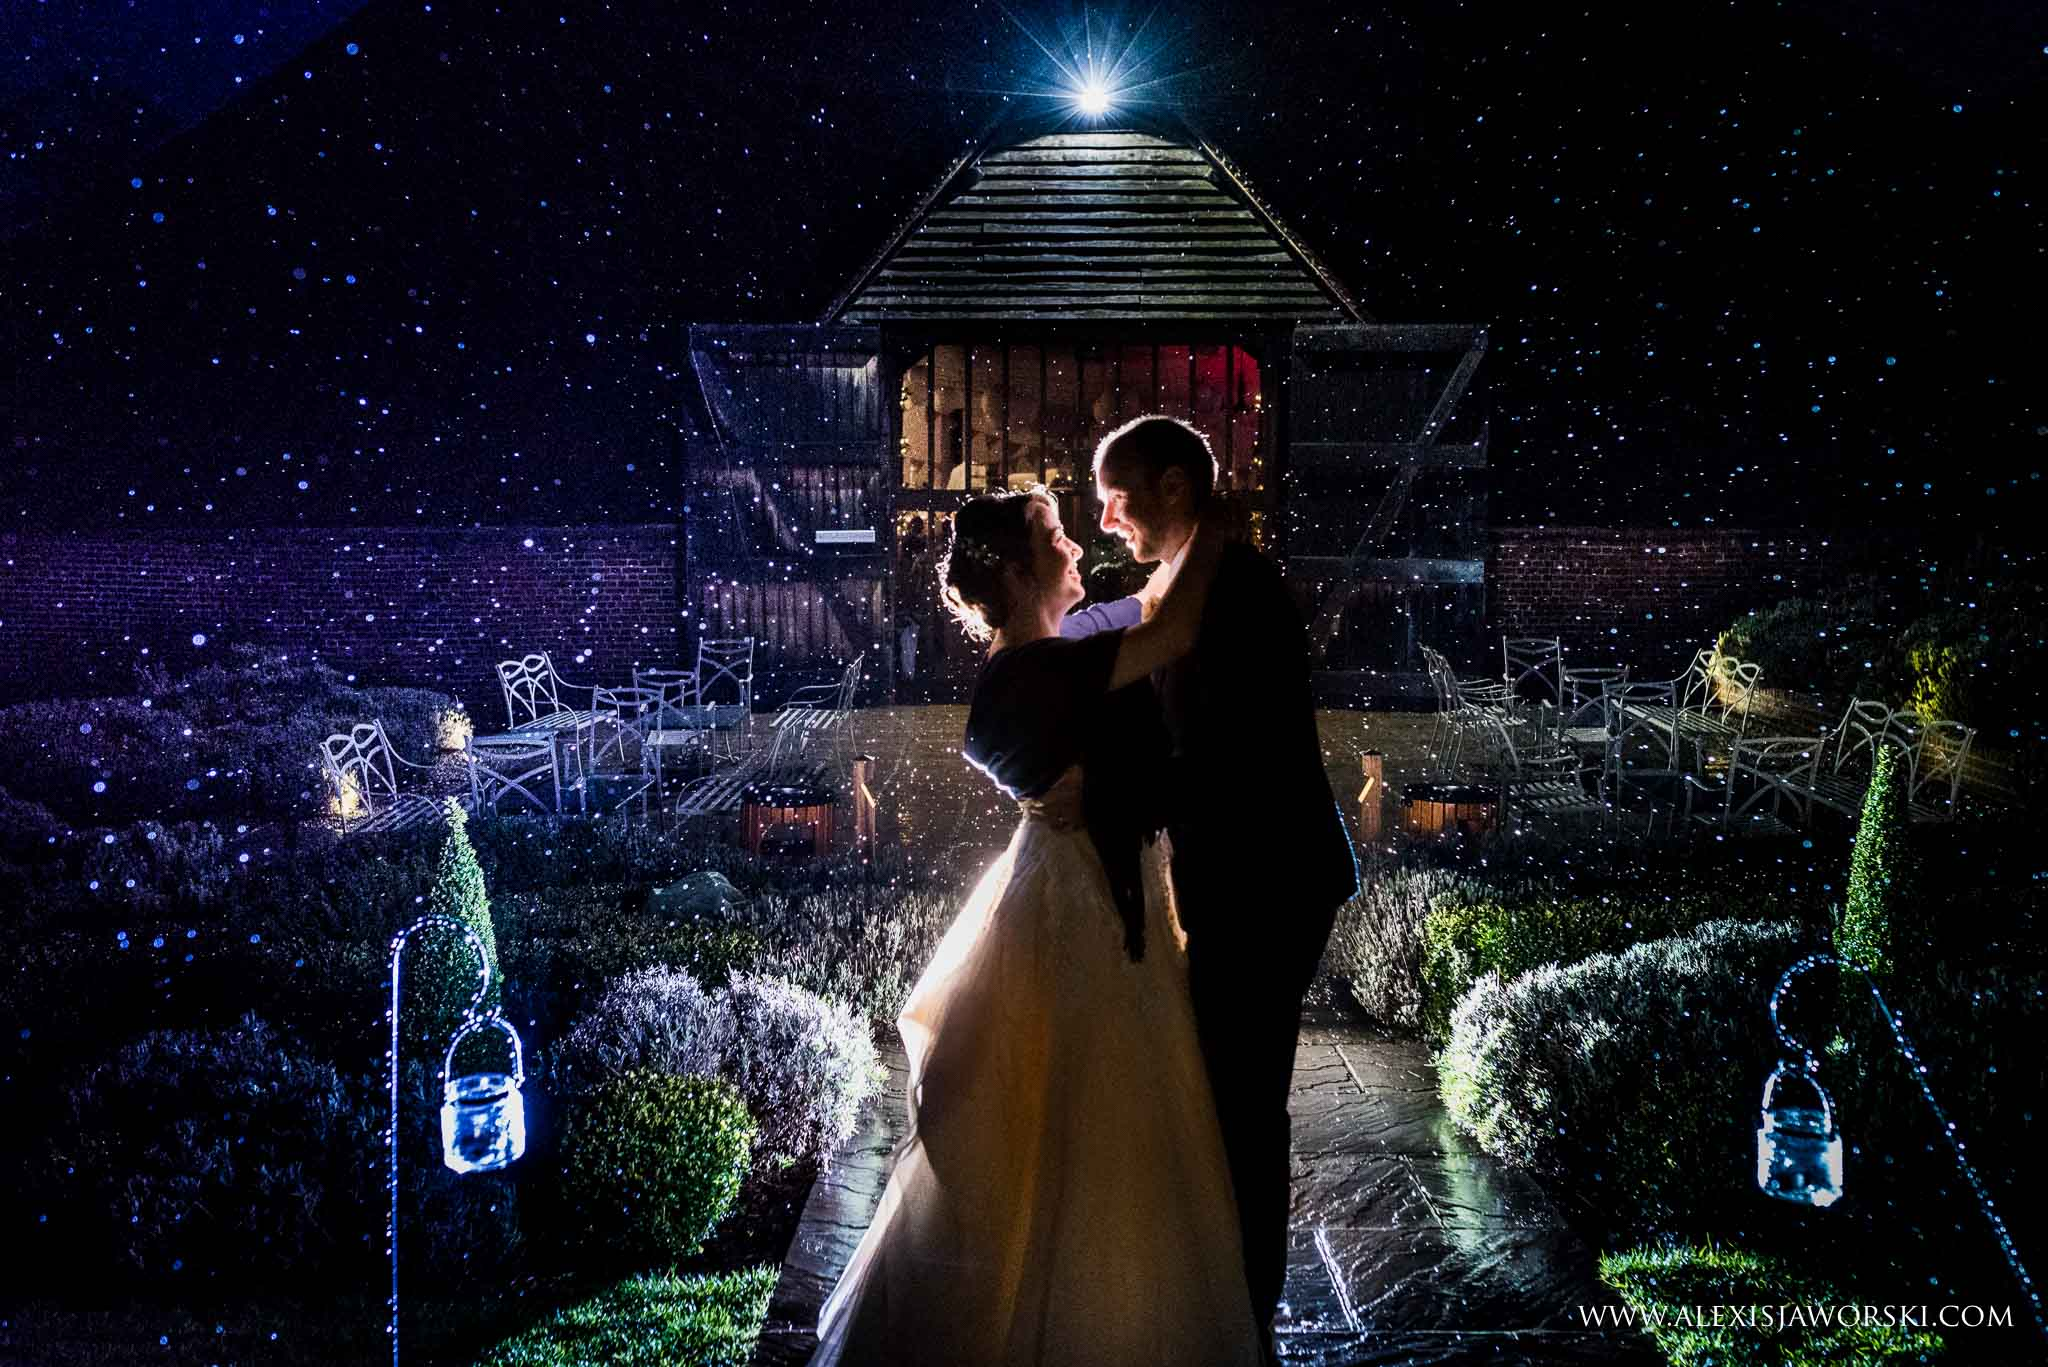 Wedding portrait in the rain at ufton court